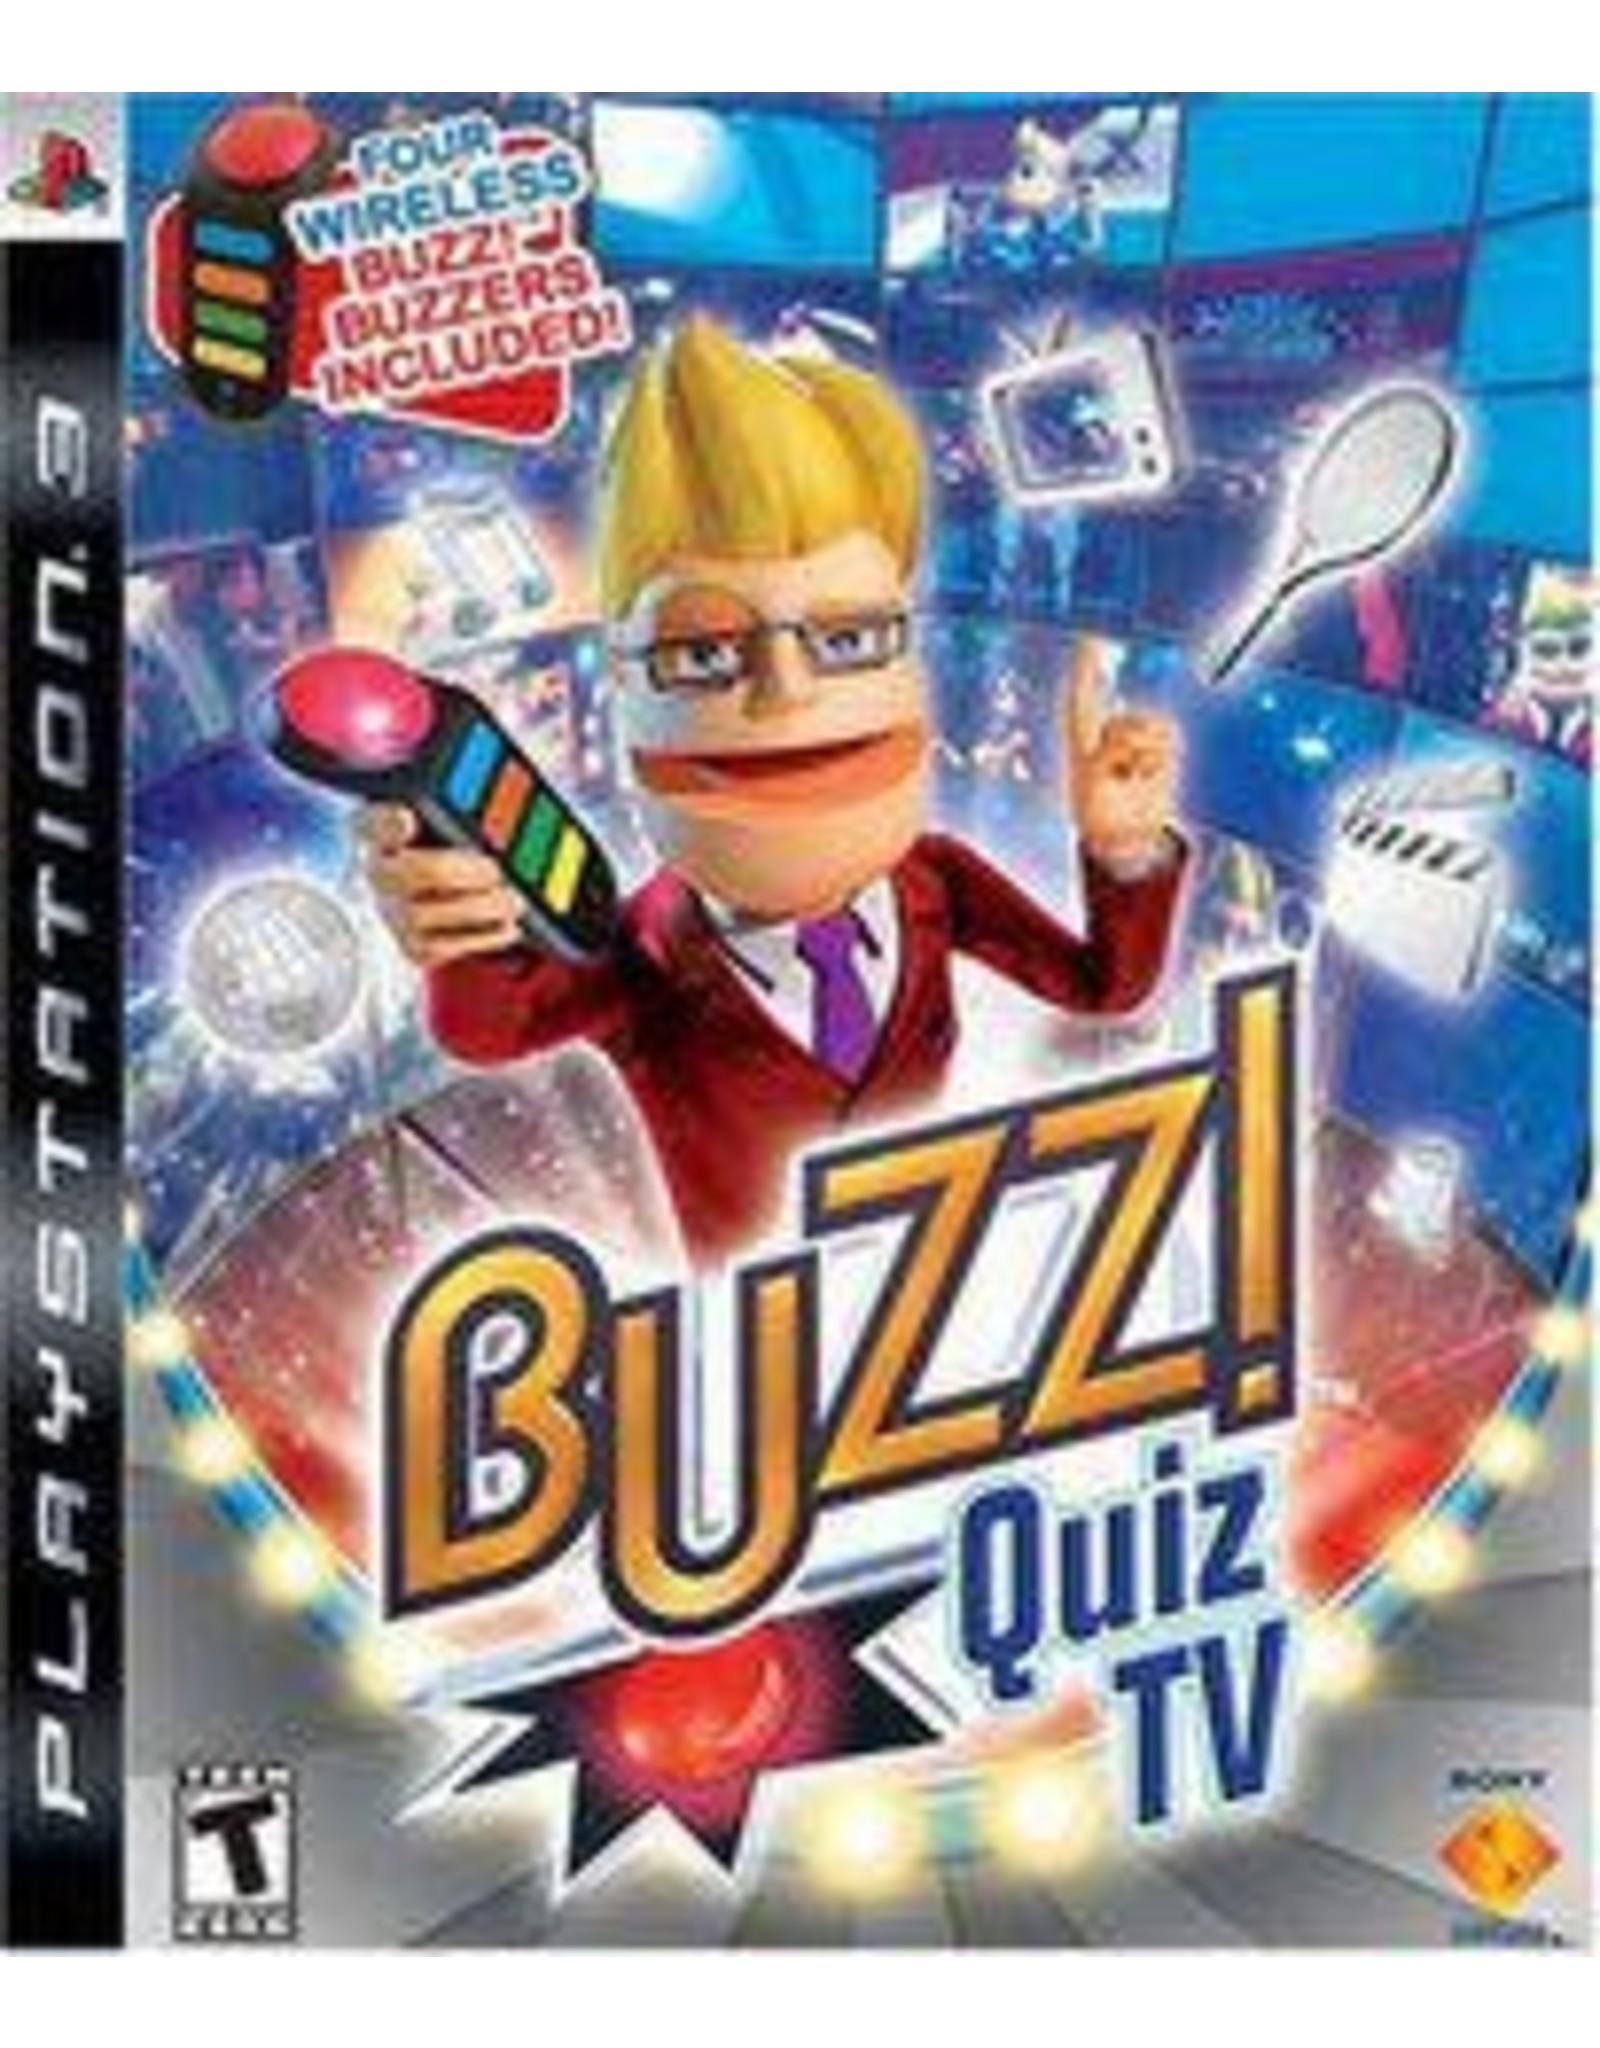 Playstation 3 Buzz! Quiz TV